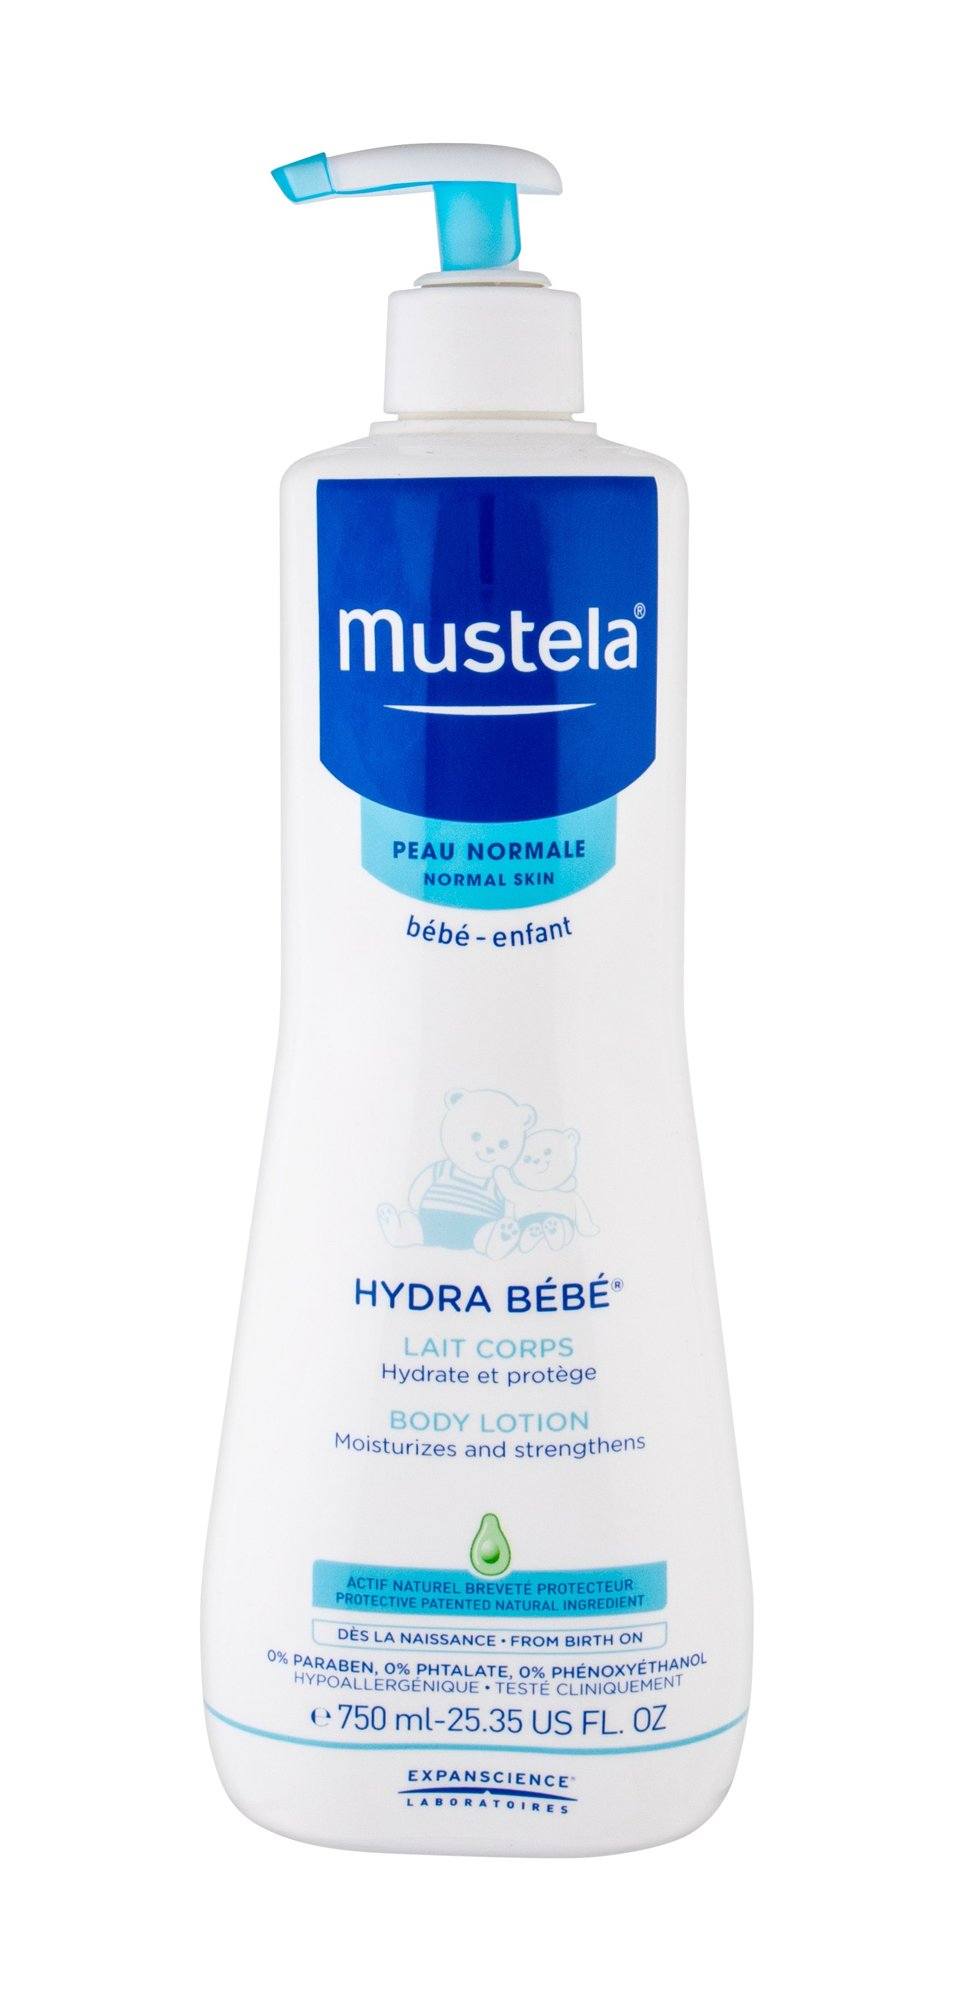 Mustela Hydra Bébé Body Lotion 750ml